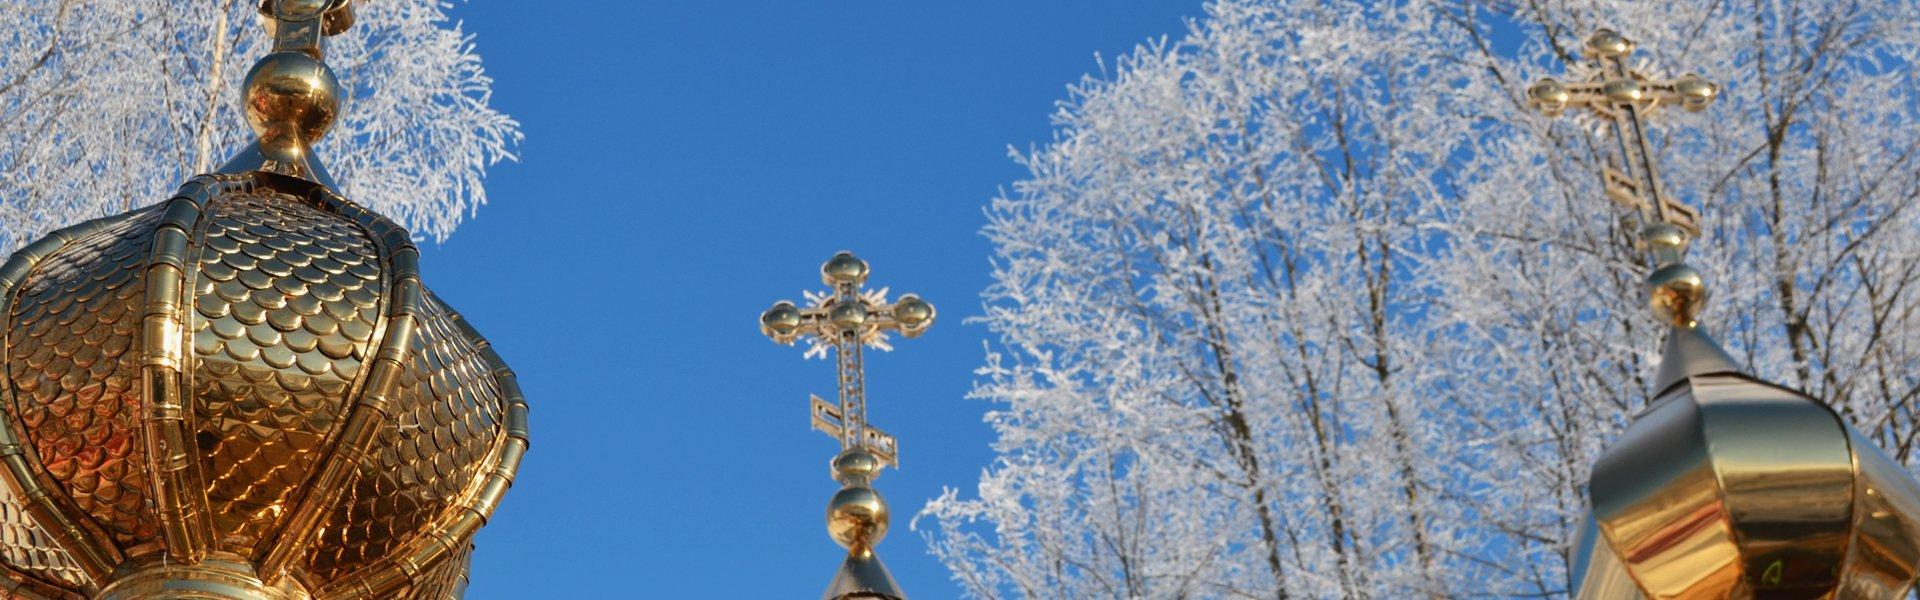 Winter in Rusland